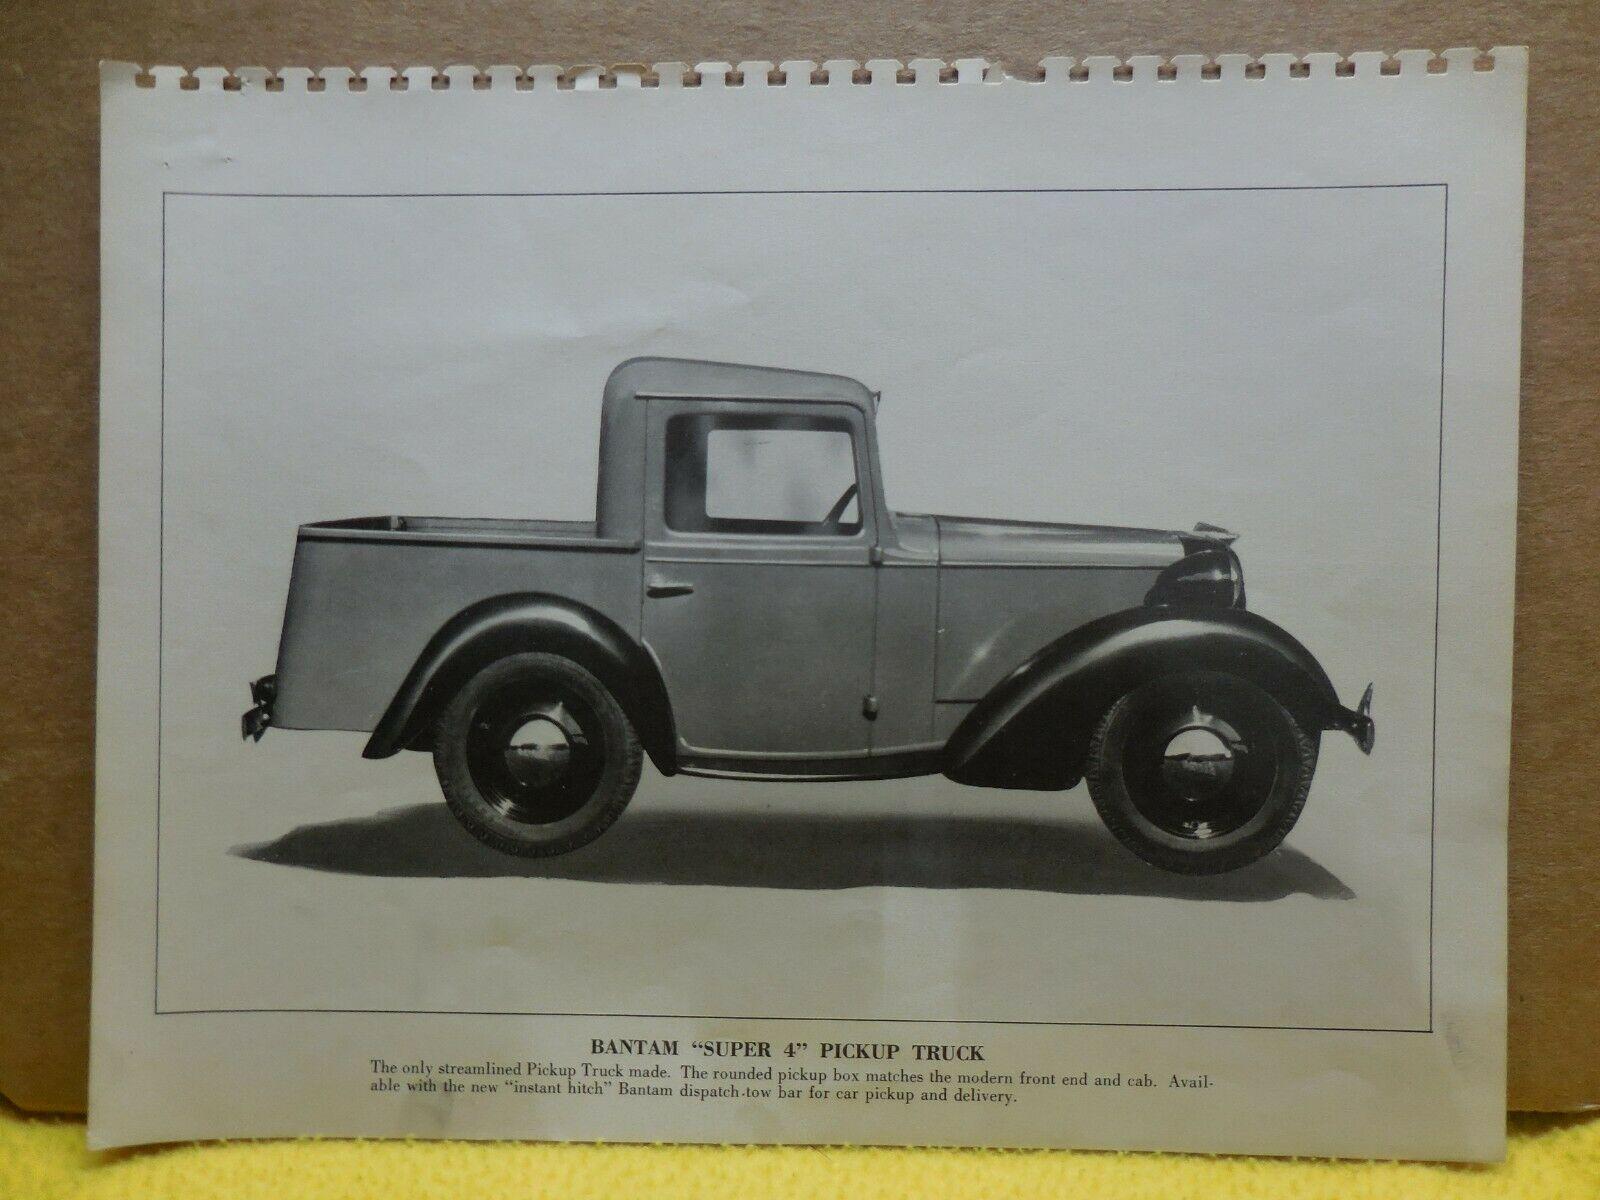 1940 Bantam Pickup Truck Factory Photo